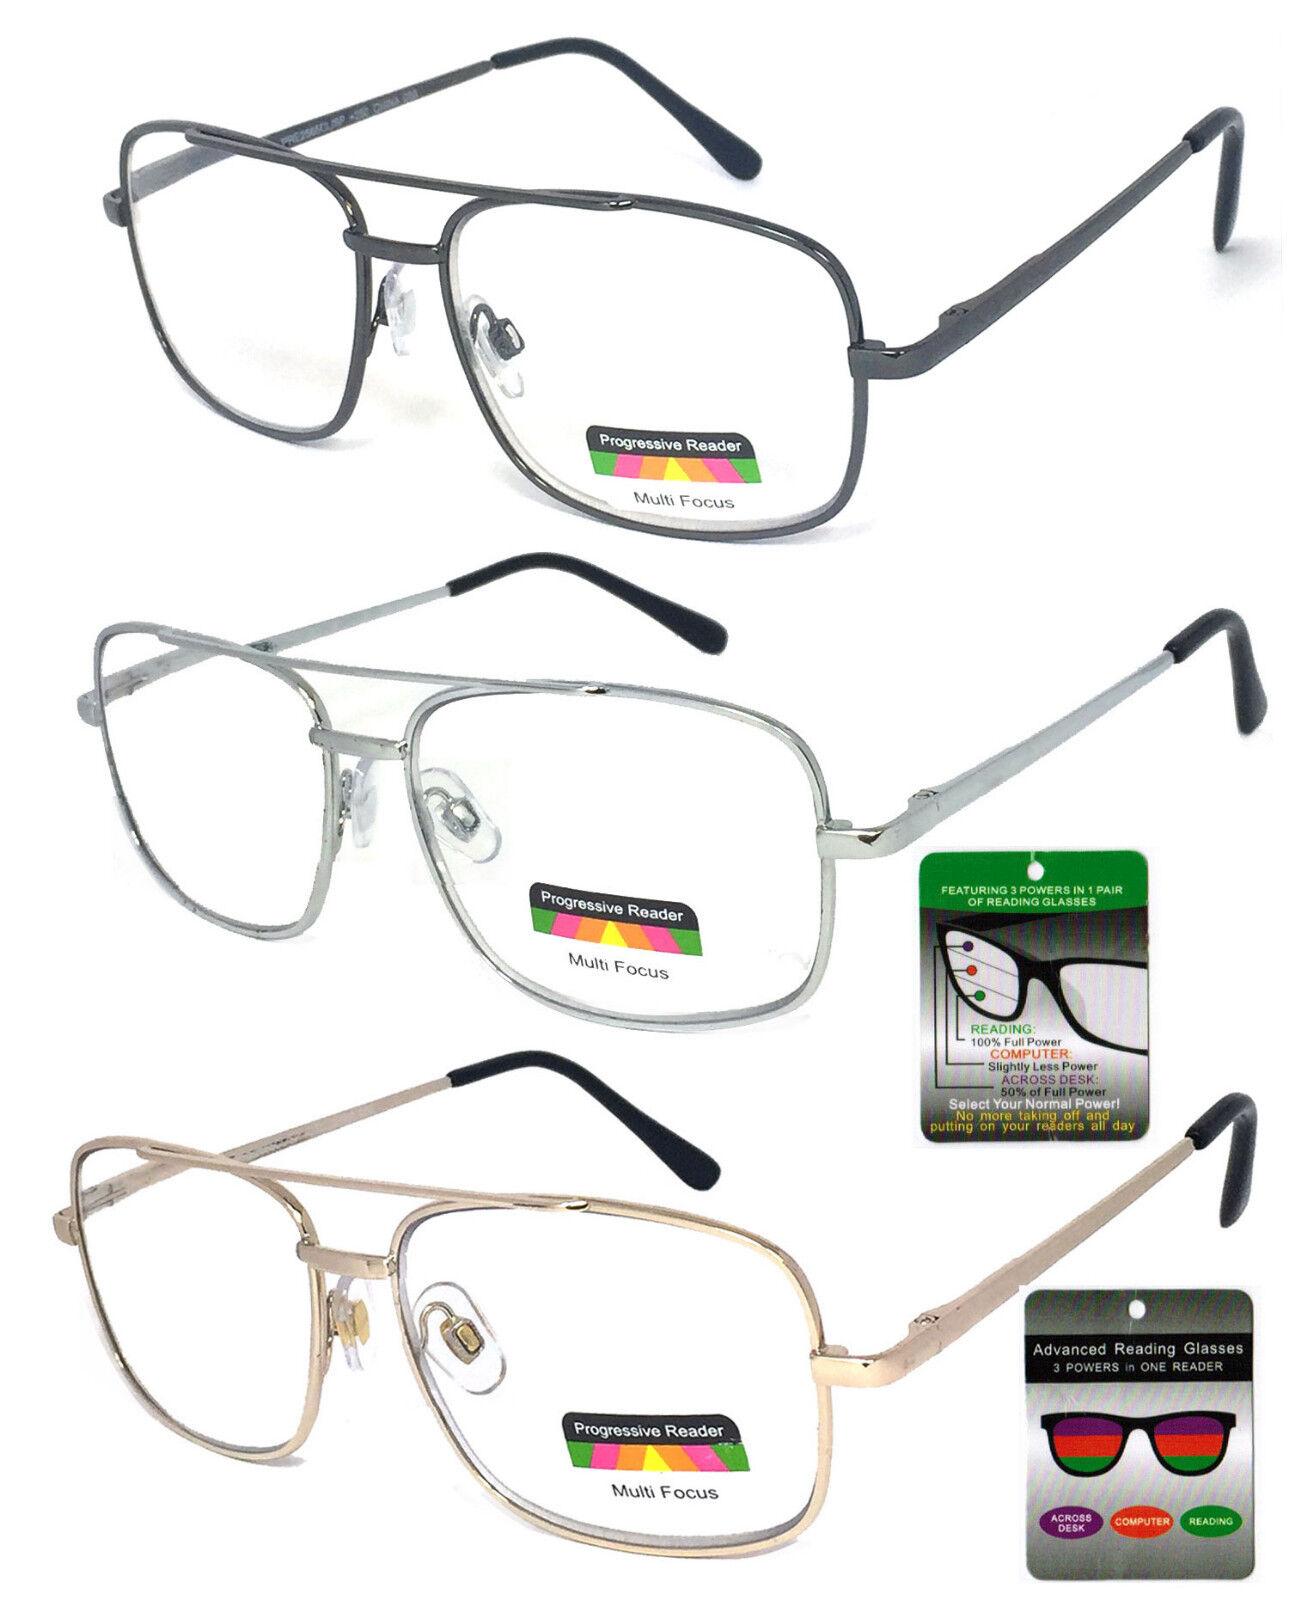 53c94d4b76d No Line Multi Focal Reading Glasses Clear Lens Aviator Spring Hinge ...